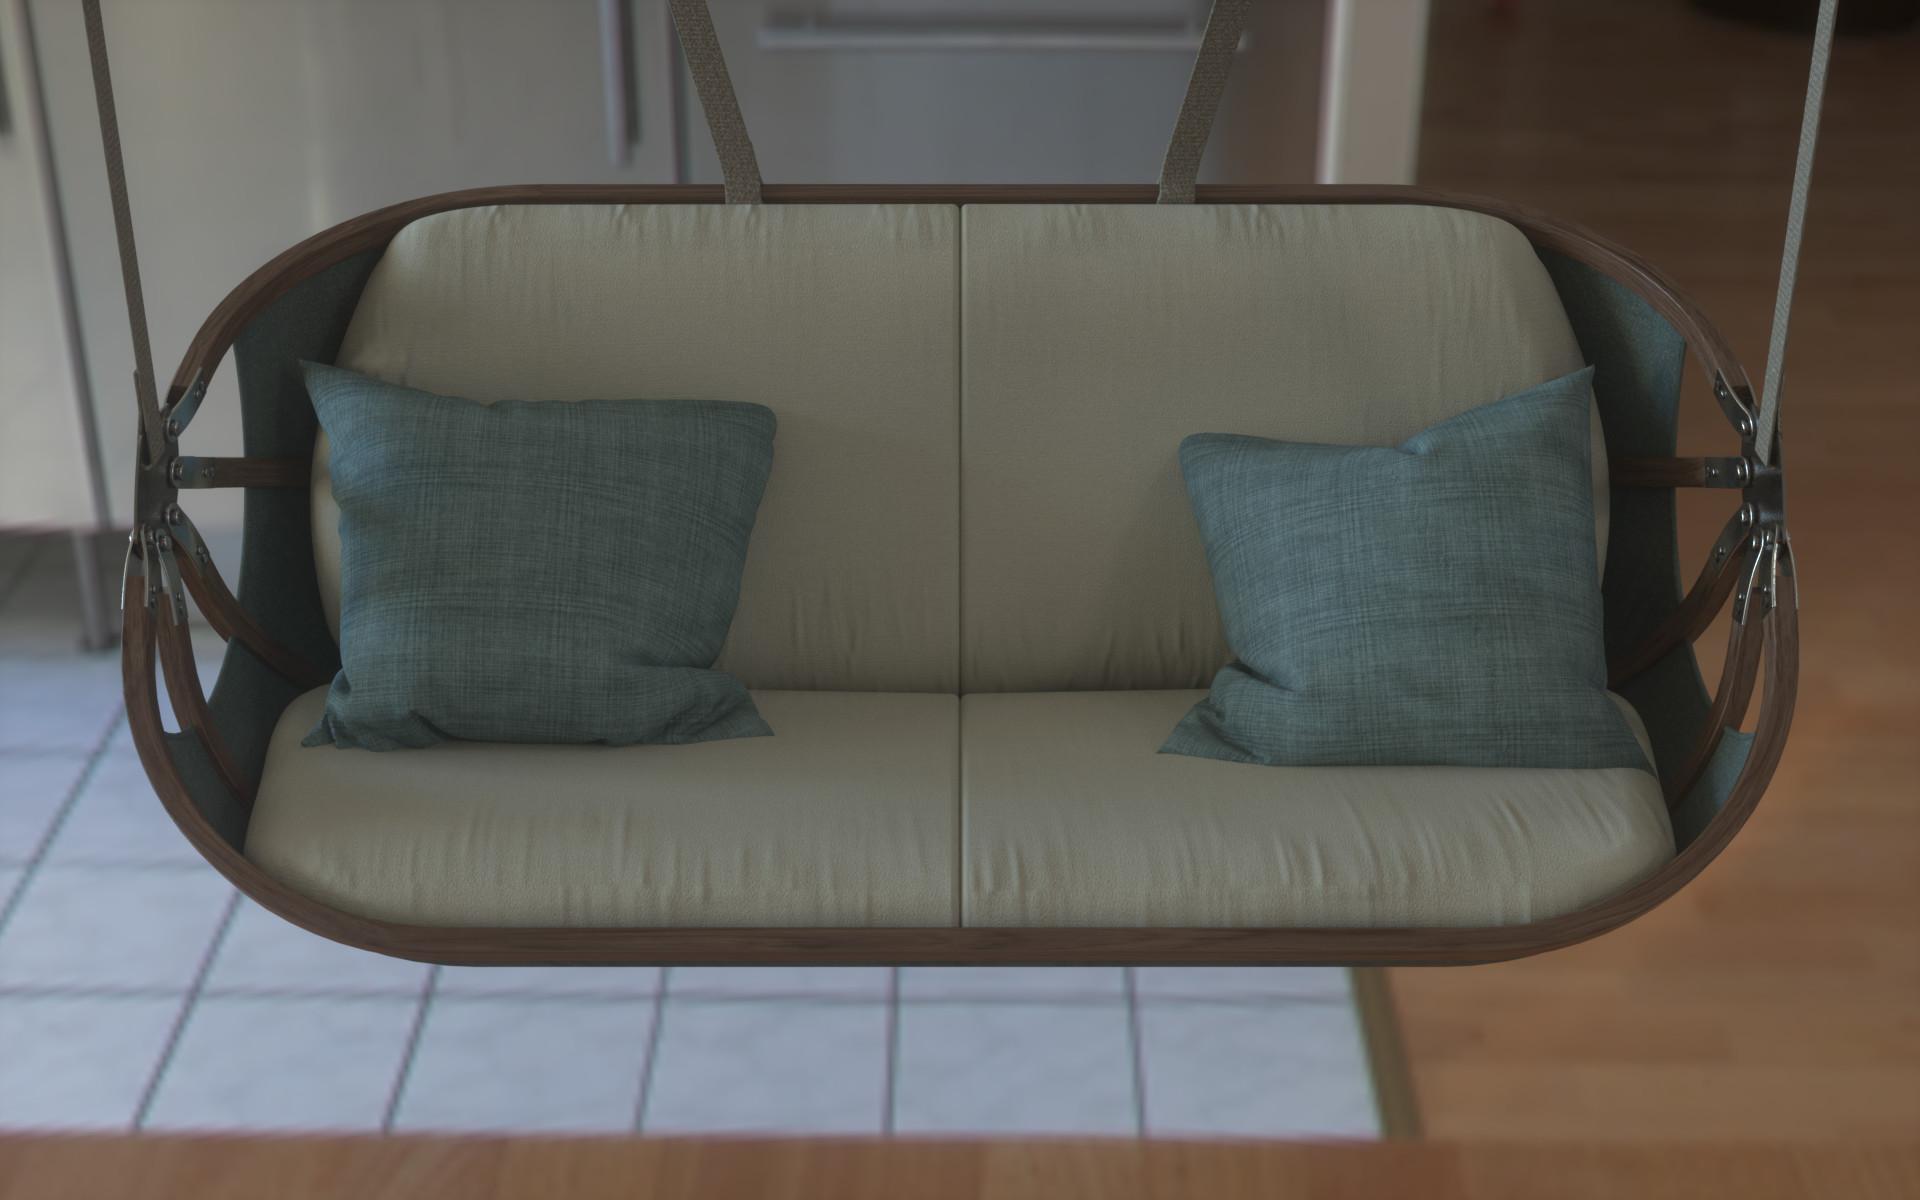 Cem tezcan swing boat sofa 00003